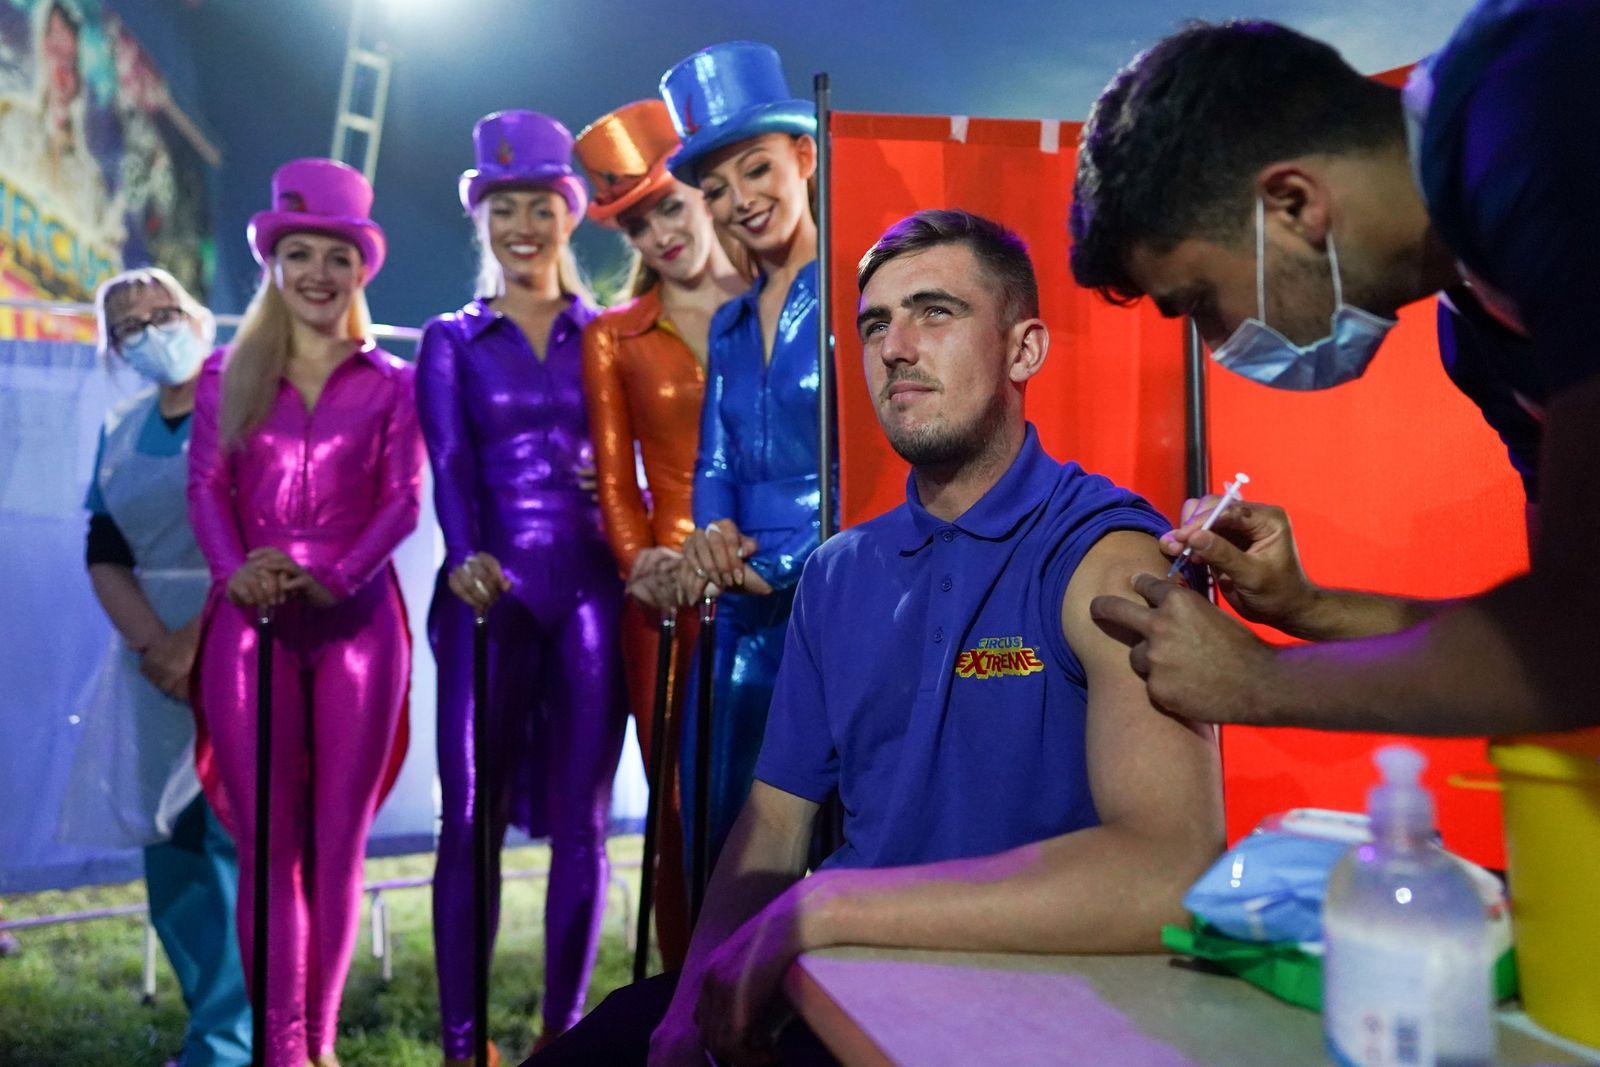 *** BESTPIX *** Circus-goers Receive Covid Vaccines Before Big Top Performance